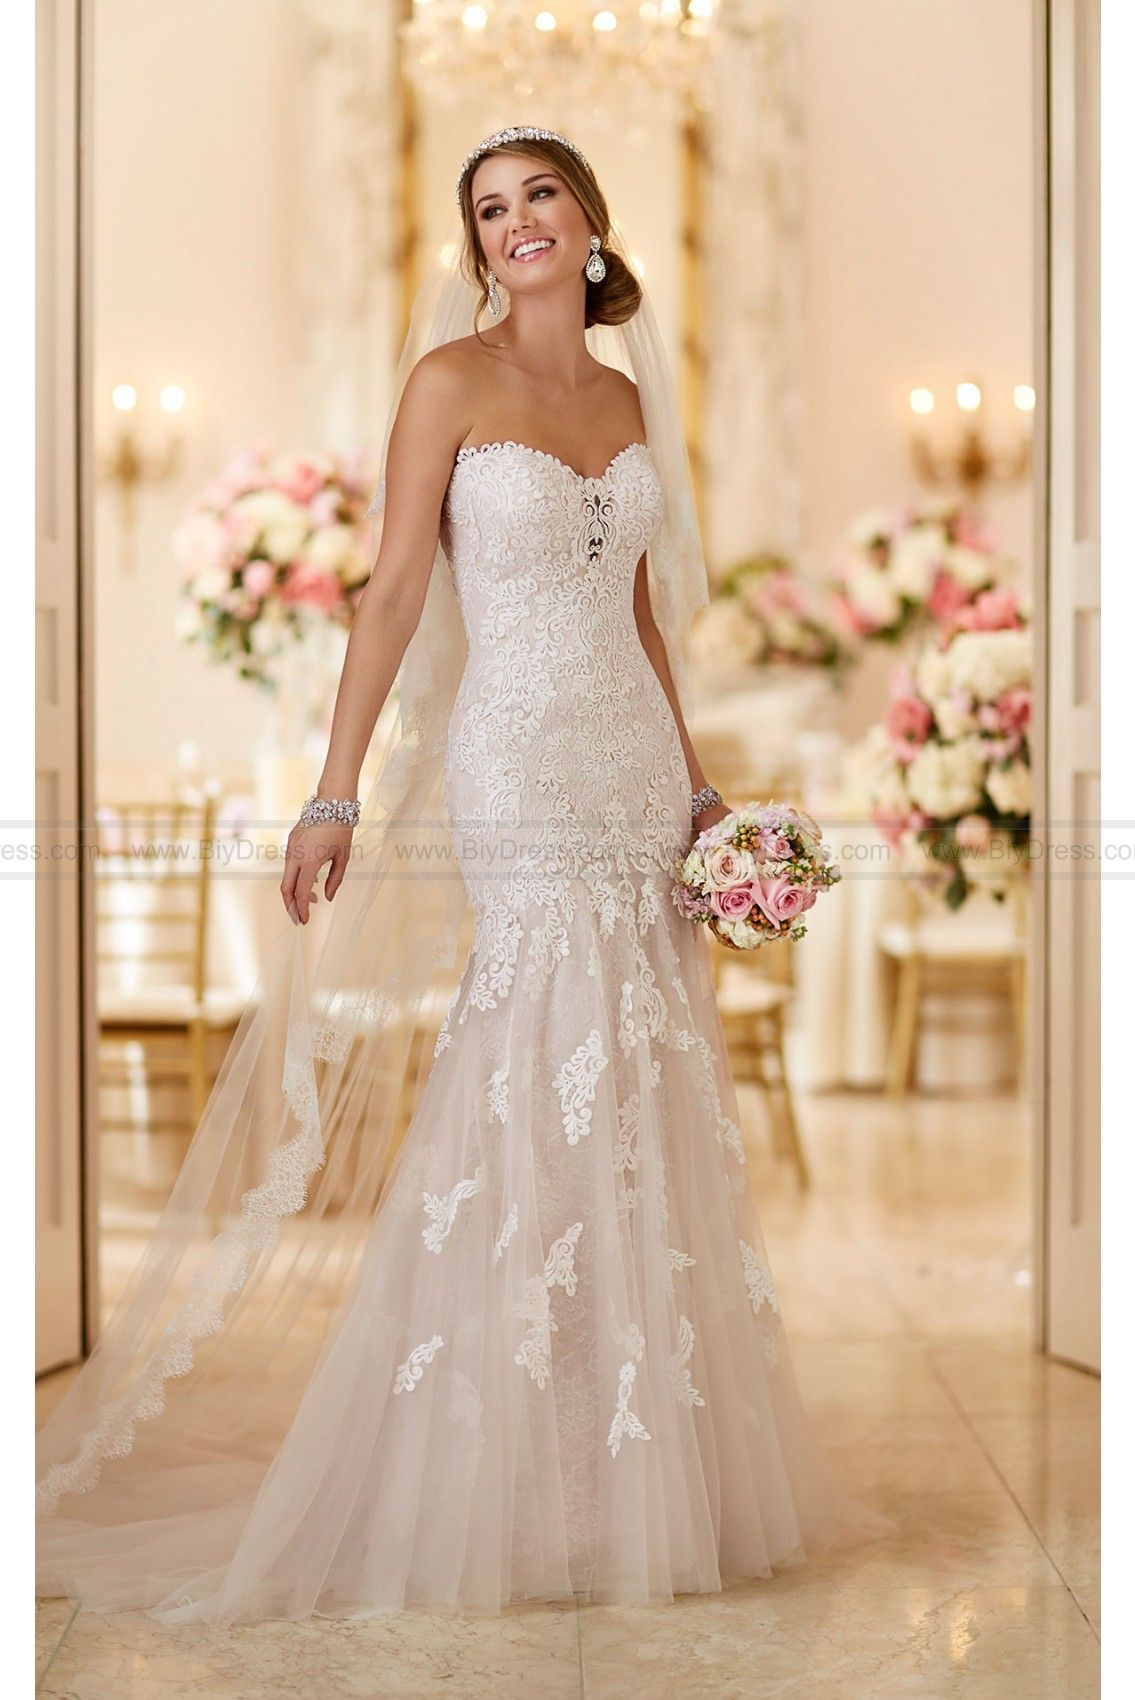 Stella york wedding dress style 6257 stella york 2016 stella york wedding dress style 6257 junglespirit Choice Image